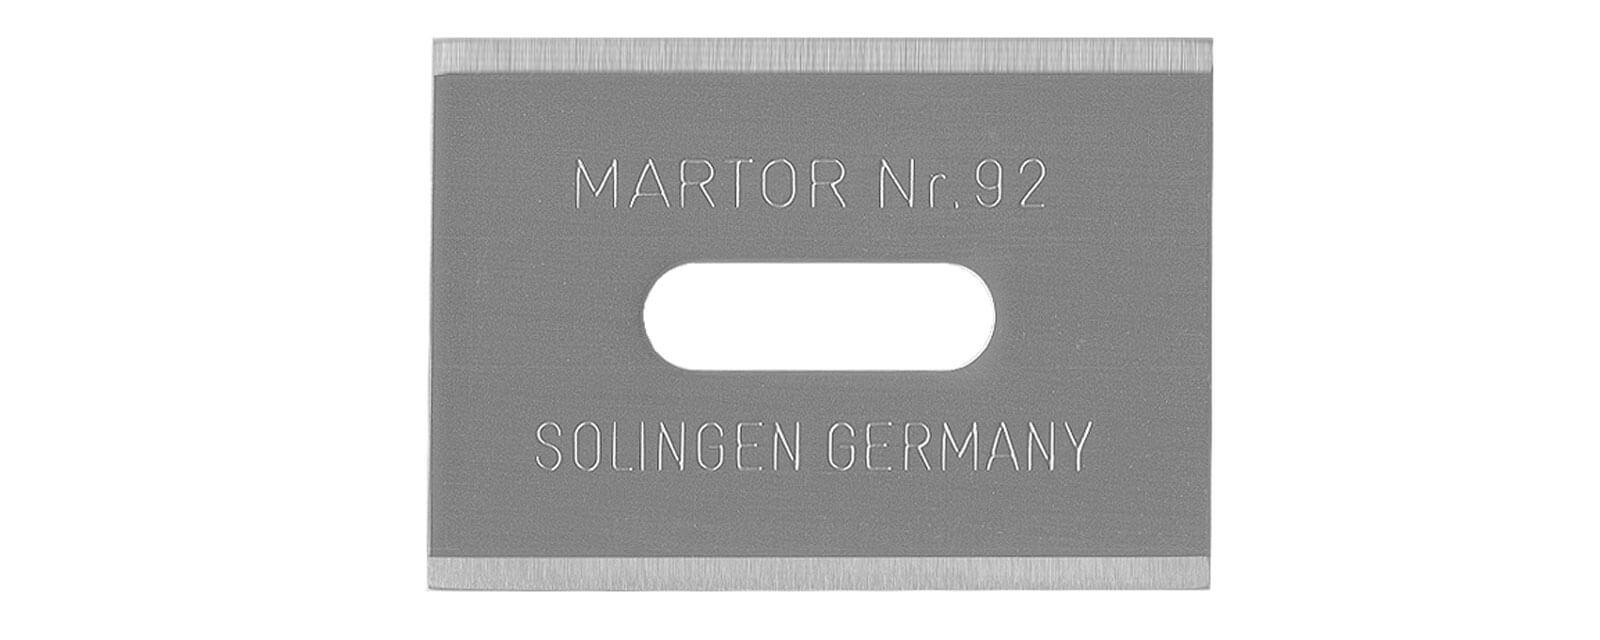 KM92-Ersatzklinge-martor-secupro-martego-92_1600